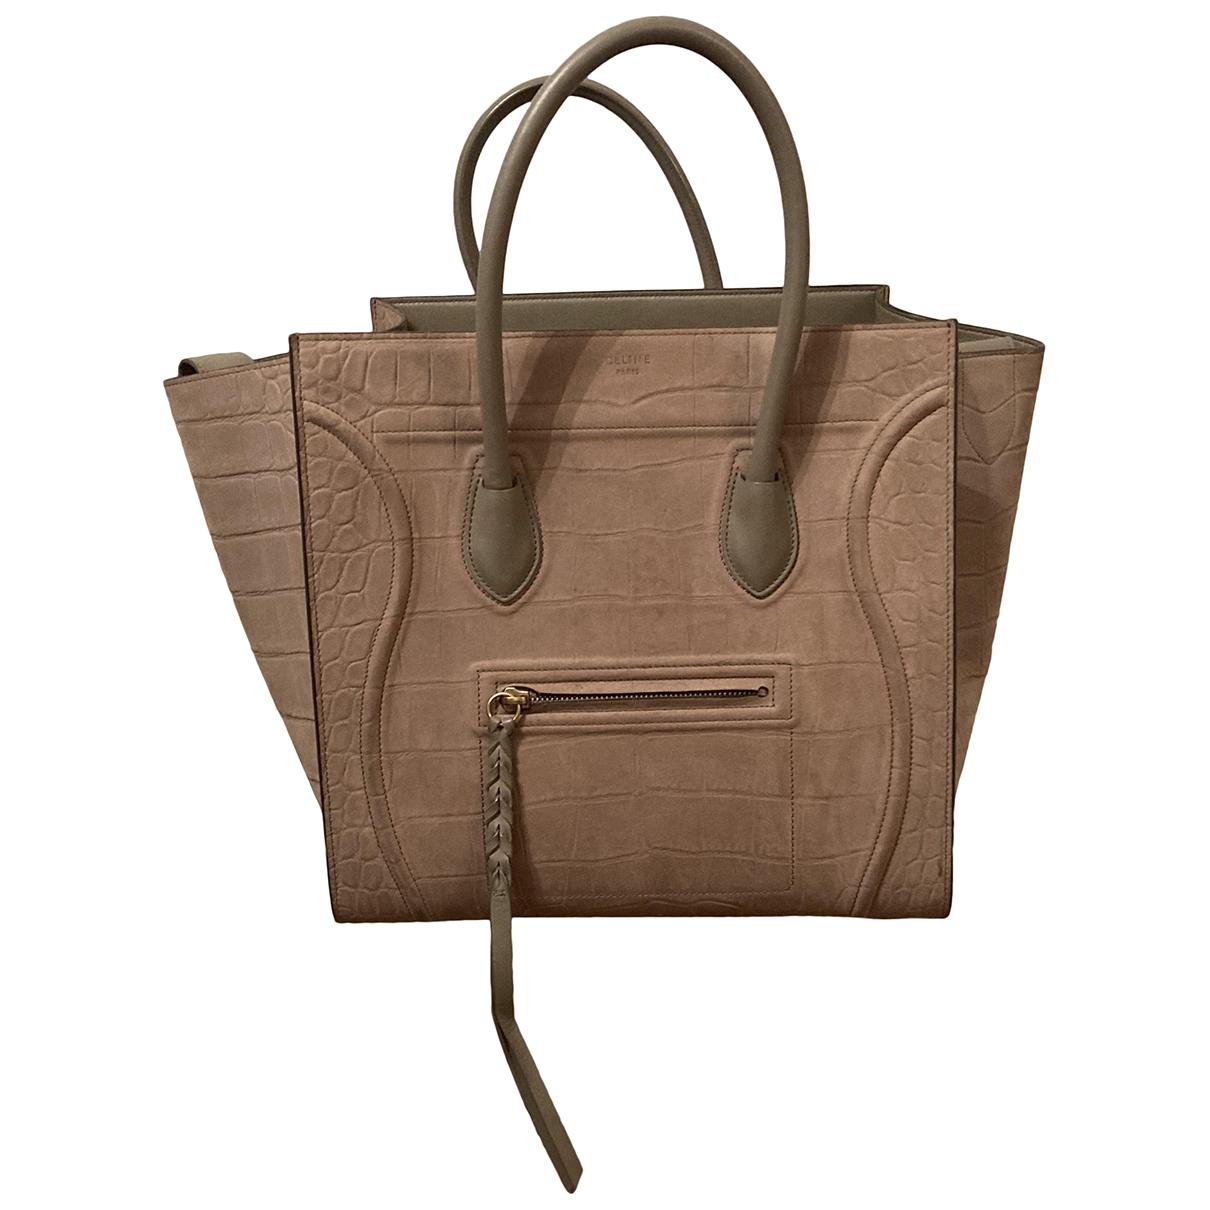 Celine - Sac a main Luggage Phantom pour femme en suede - beige